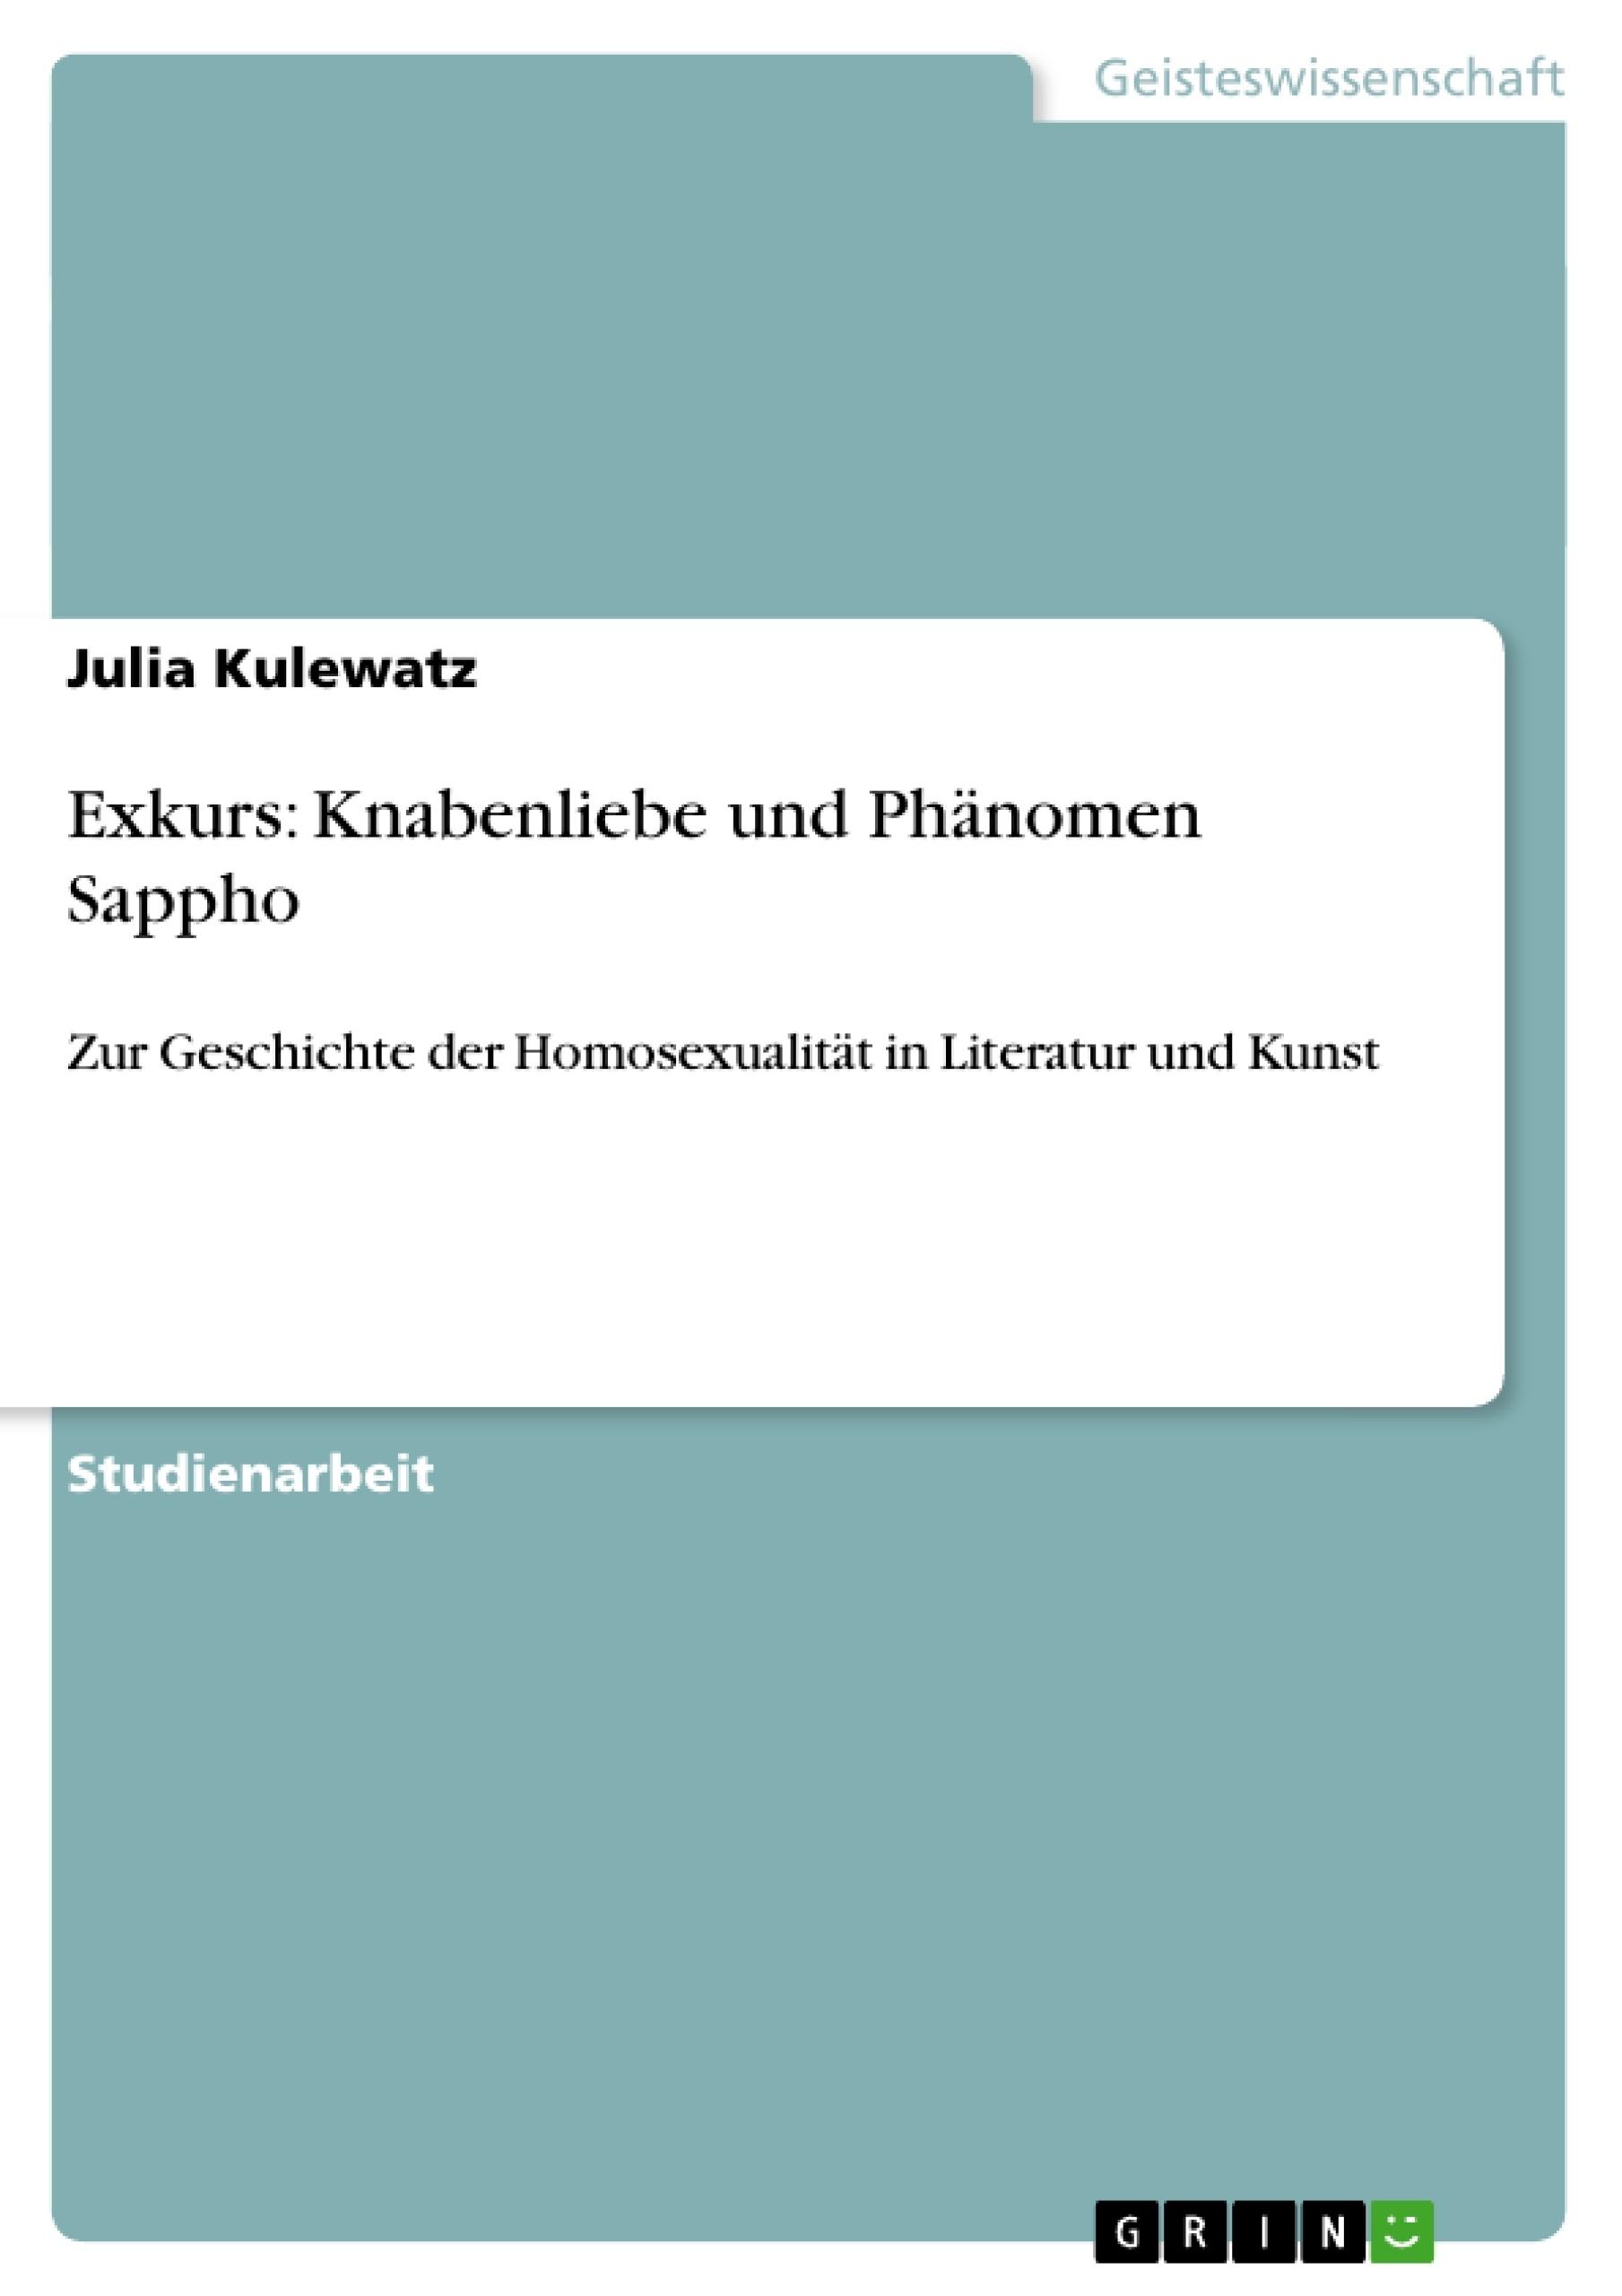 Titel: Exkurs: Knabenliebe und Phänomen Sappho